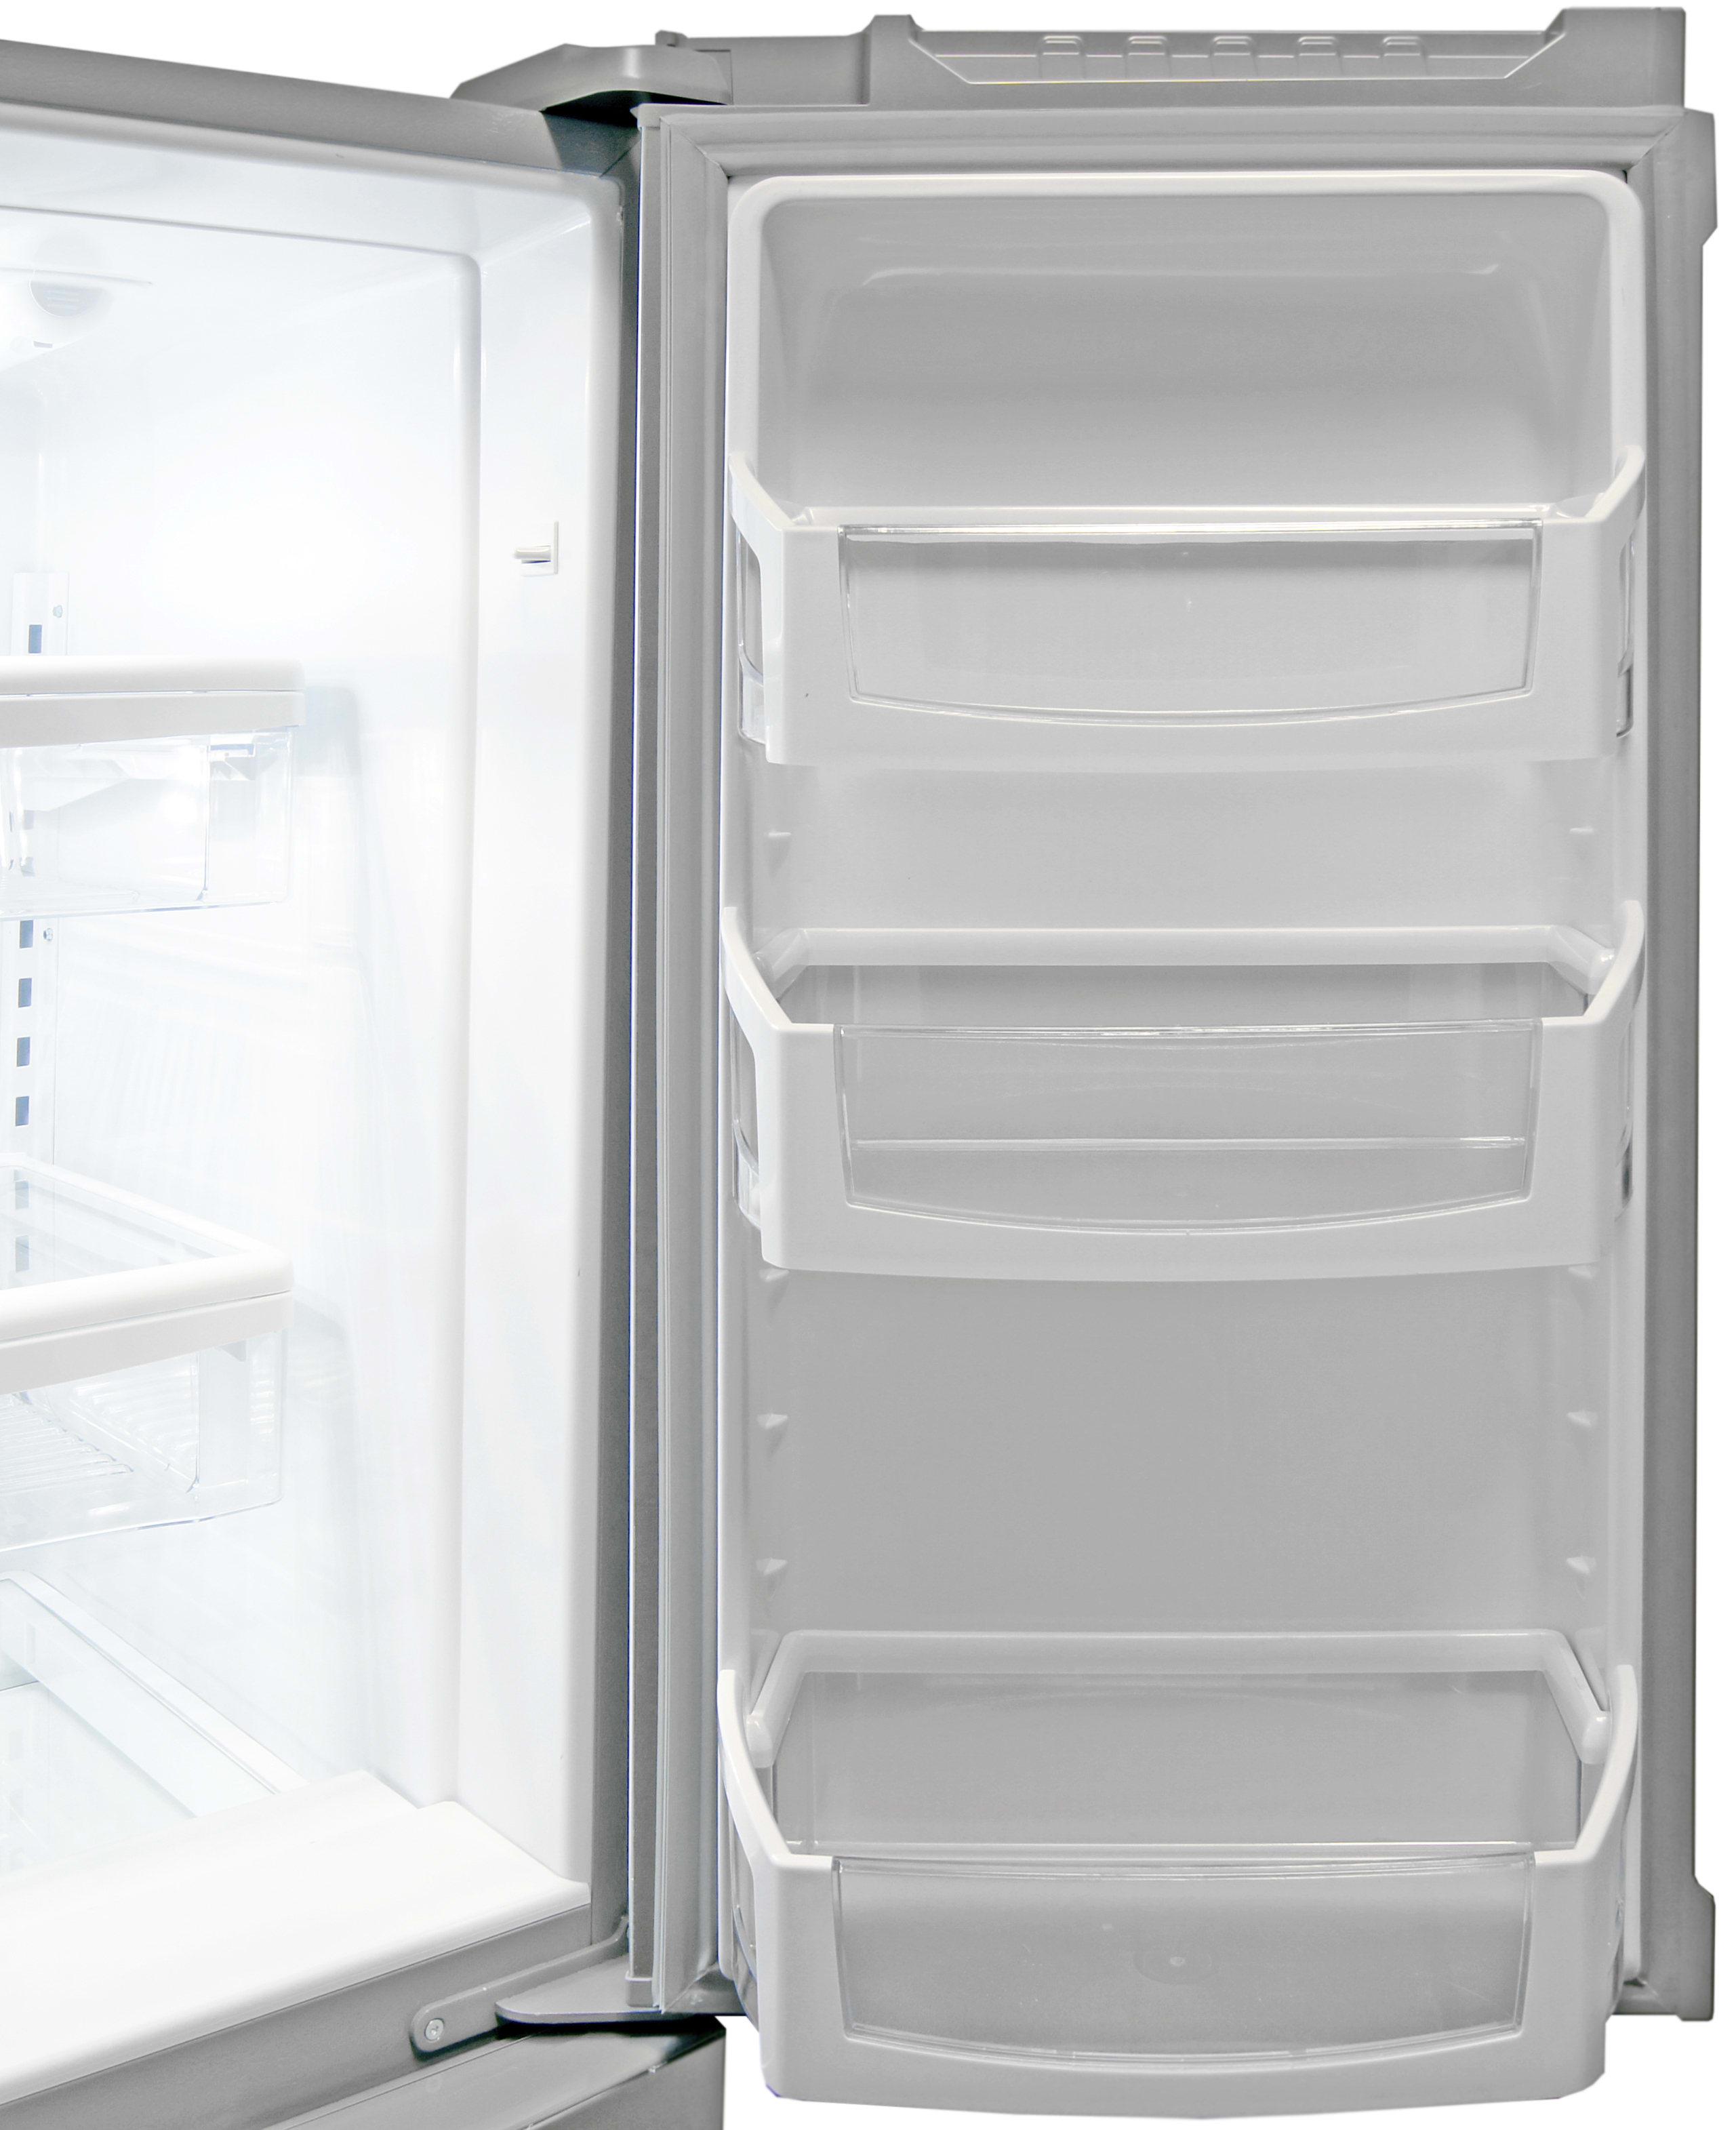 Gallon-sized bucket storage can be found on the Whirlpool WRX735SDBM's right fridge door.